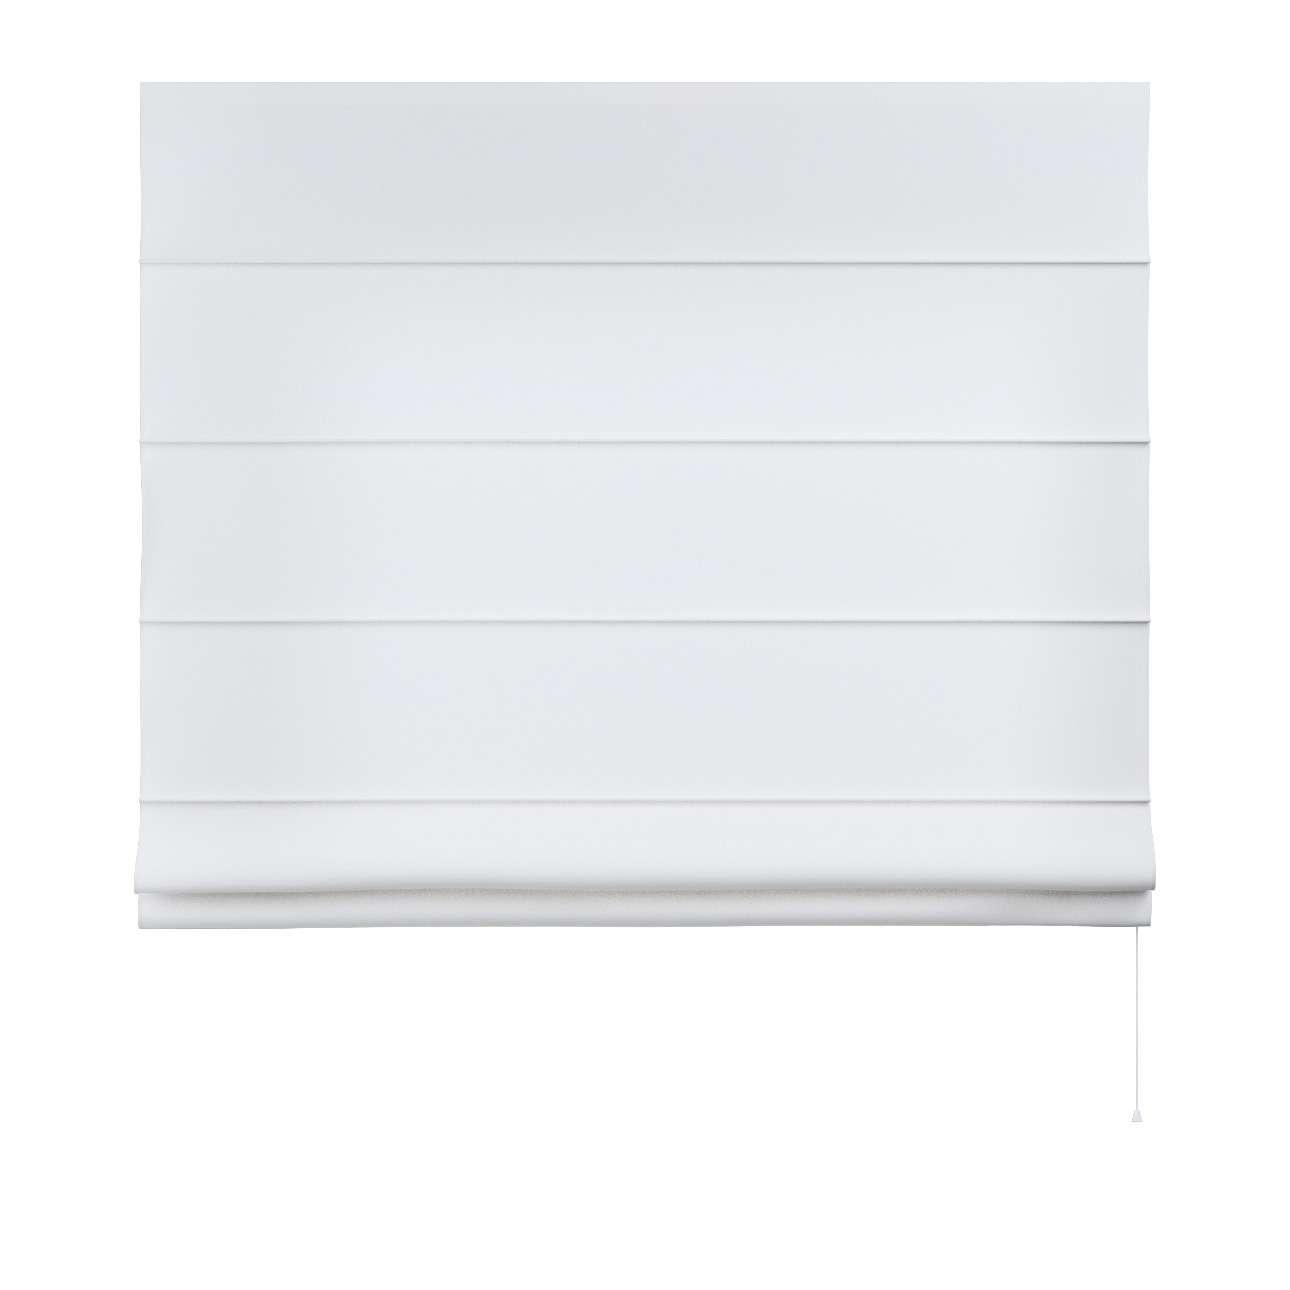 Foldegardin Capri<br/>Uden flæsekant 80 x 170 cm fra kollektionen Loneta, Stof: 133-02